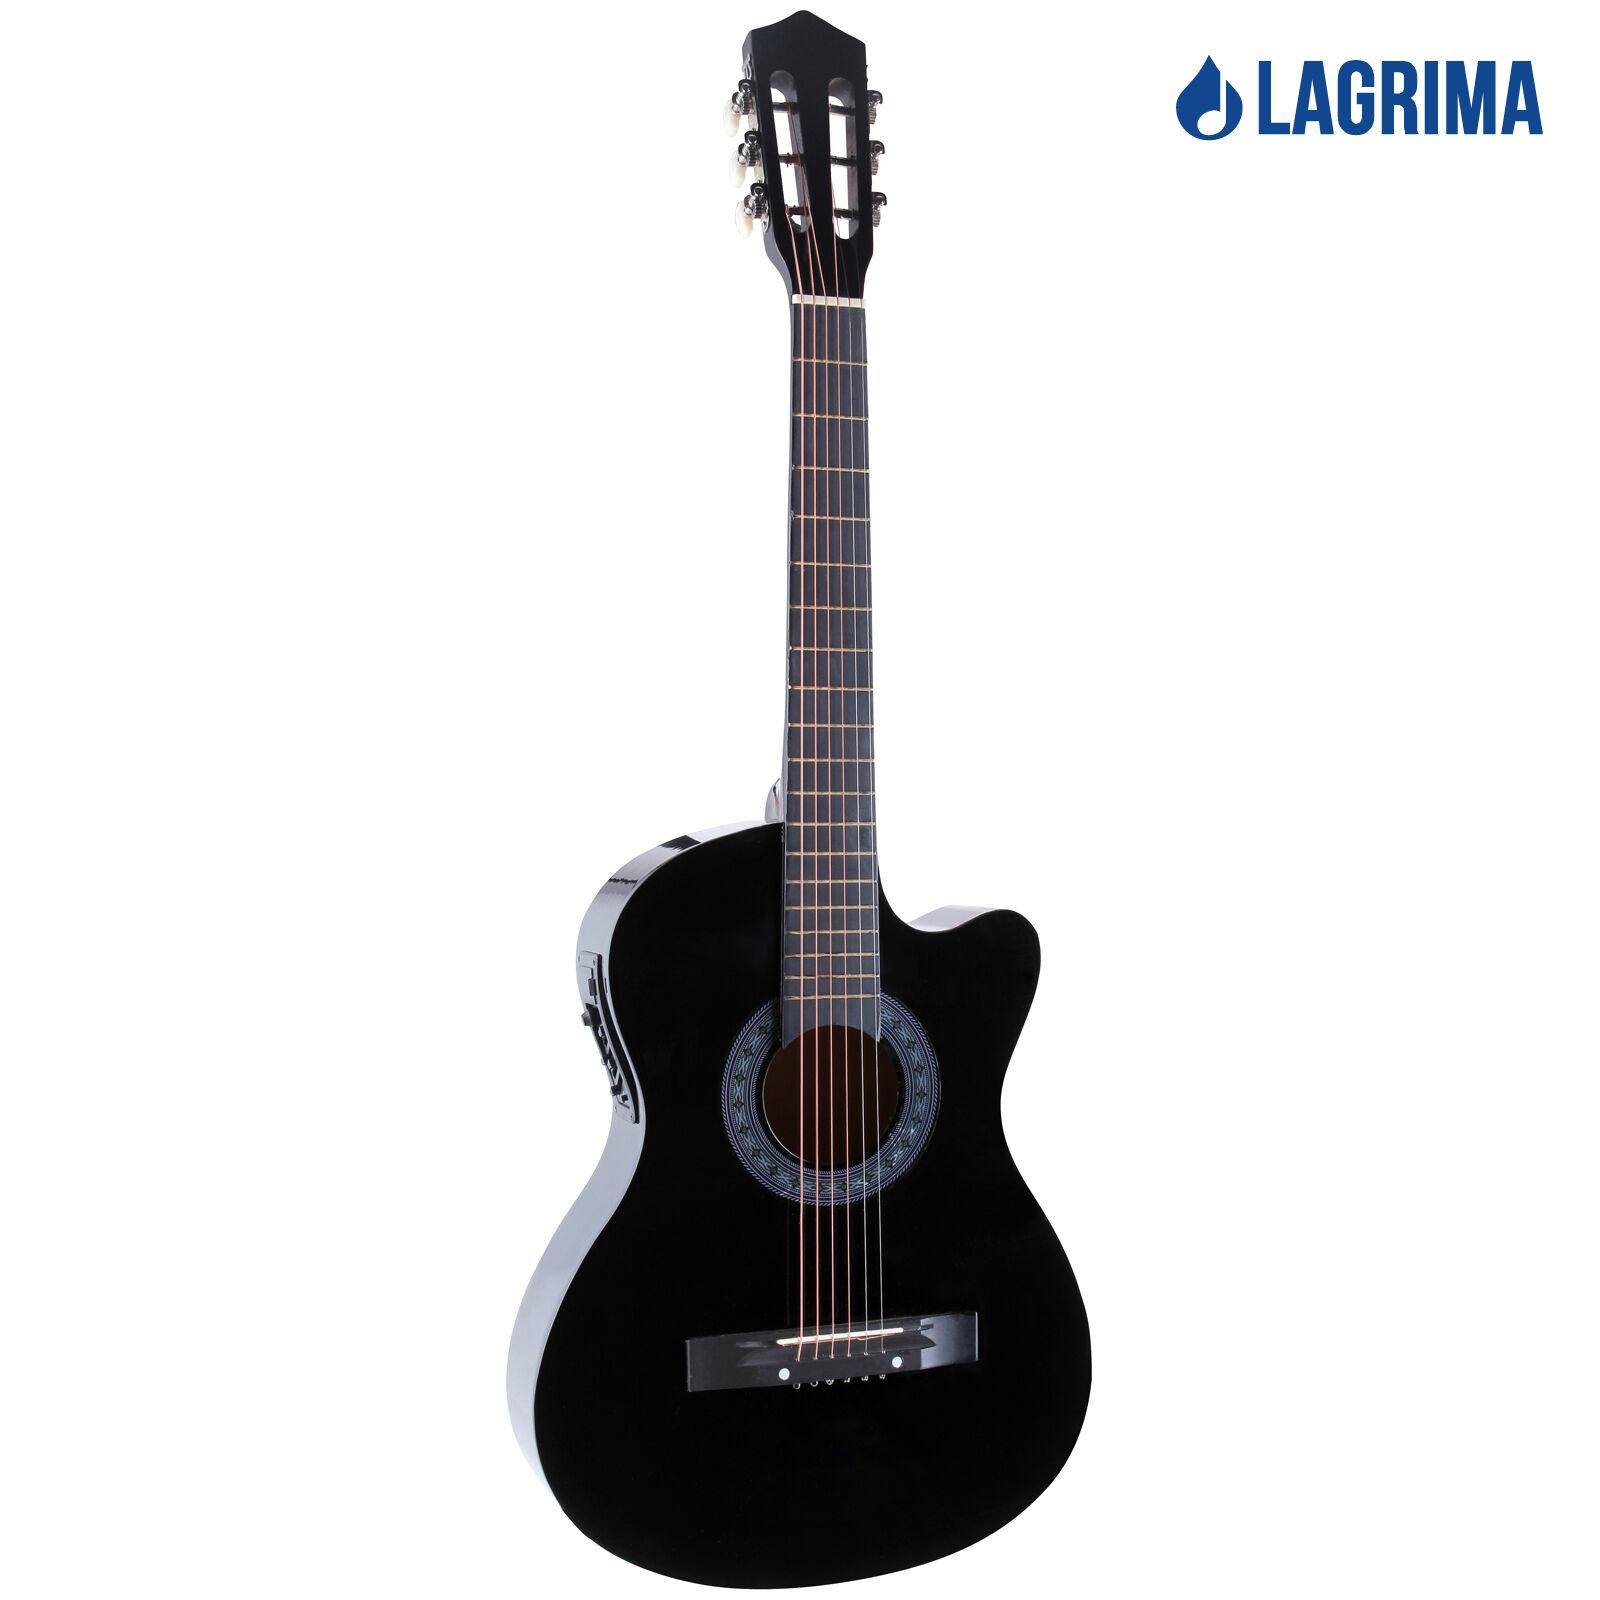 38 electric acoustic guitar cutaway design with guitar case strap tuner black 699985406695 ebay. Black Bedroom Furniture Sets. Home Design Ideas